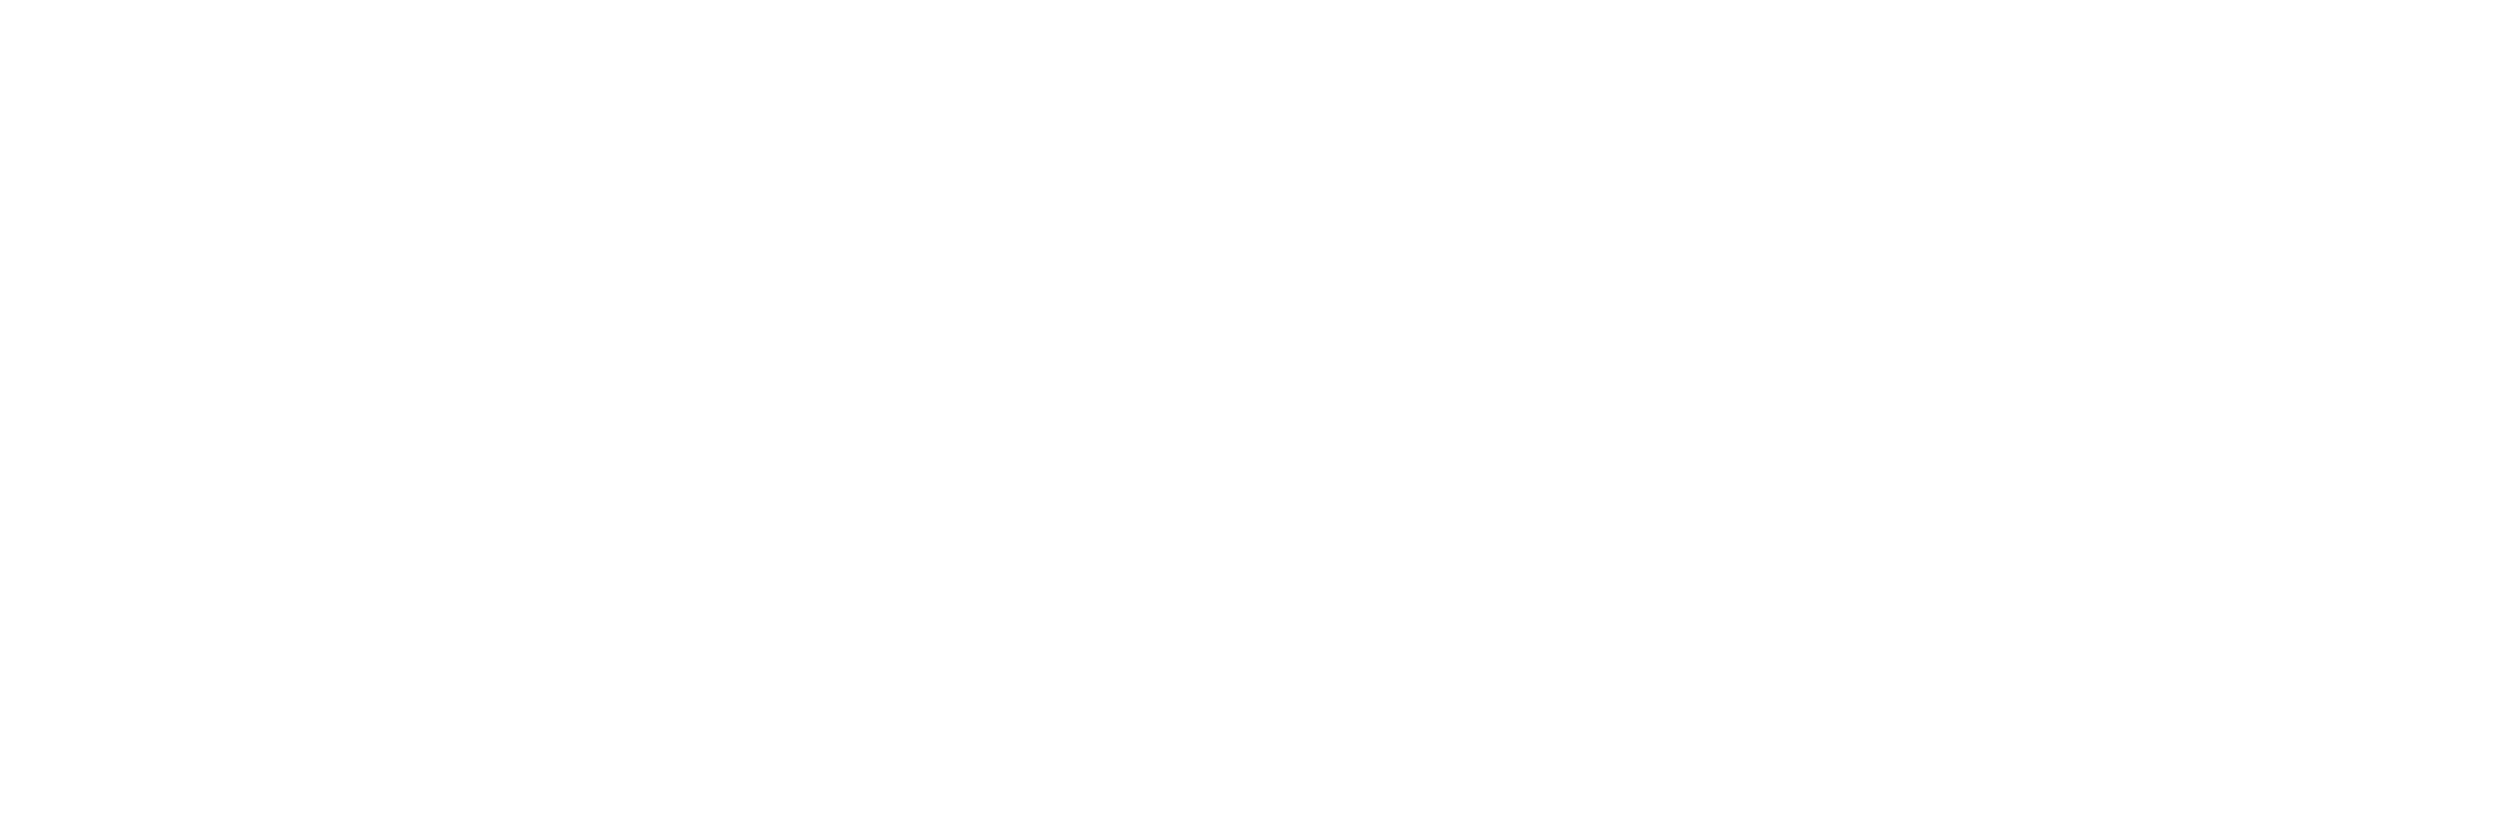 DigitalMarketer Certified partner